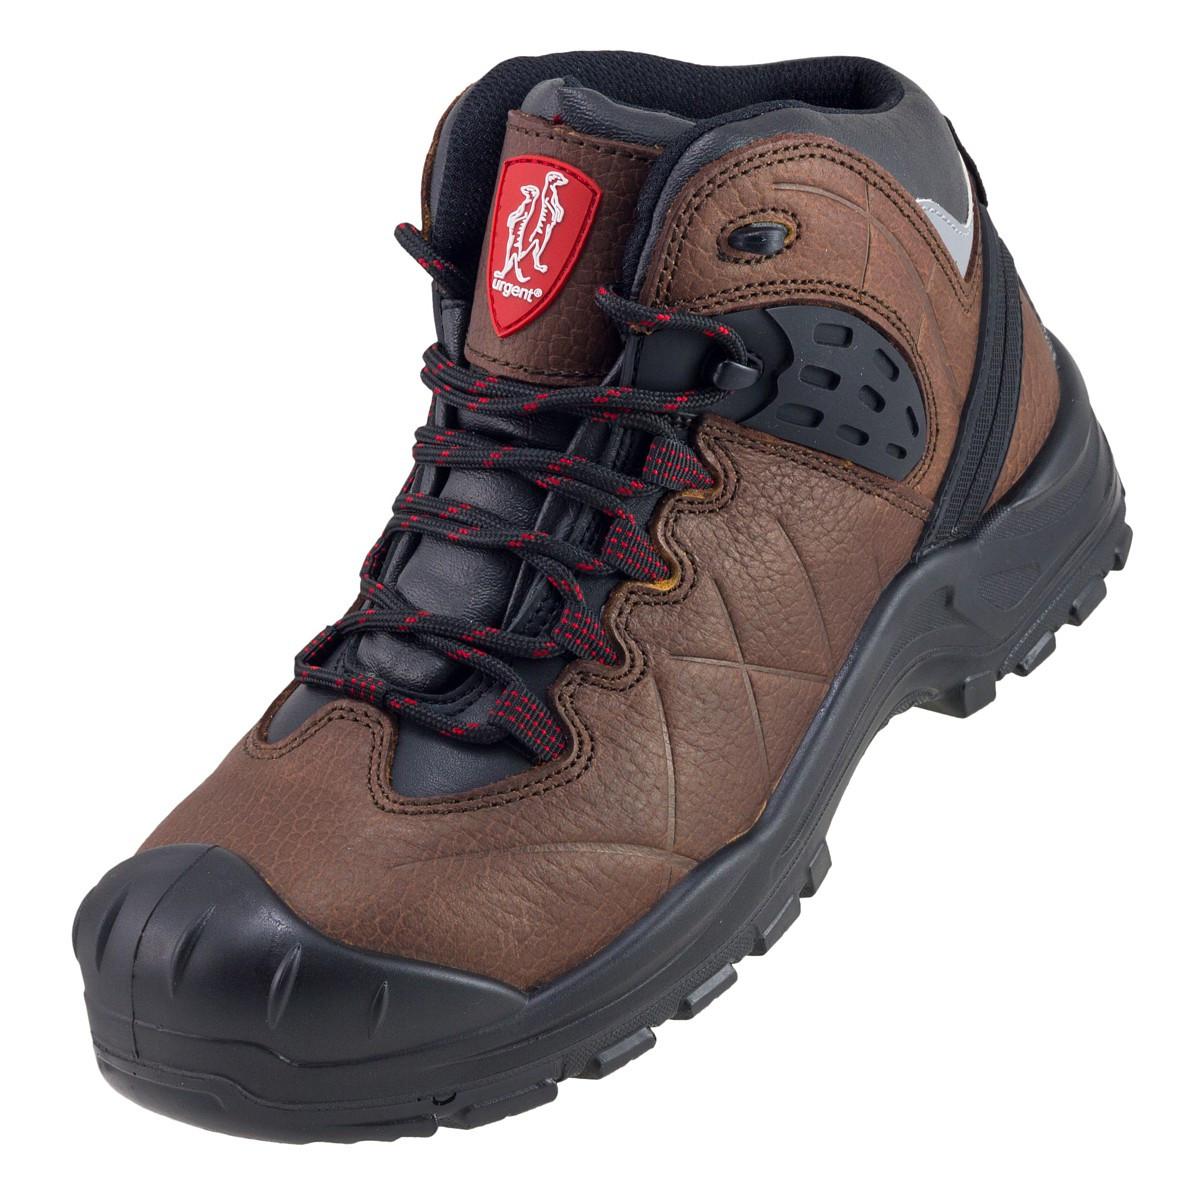 Ботинки  131 S1 с металлическим носком,антистатические. Urgent